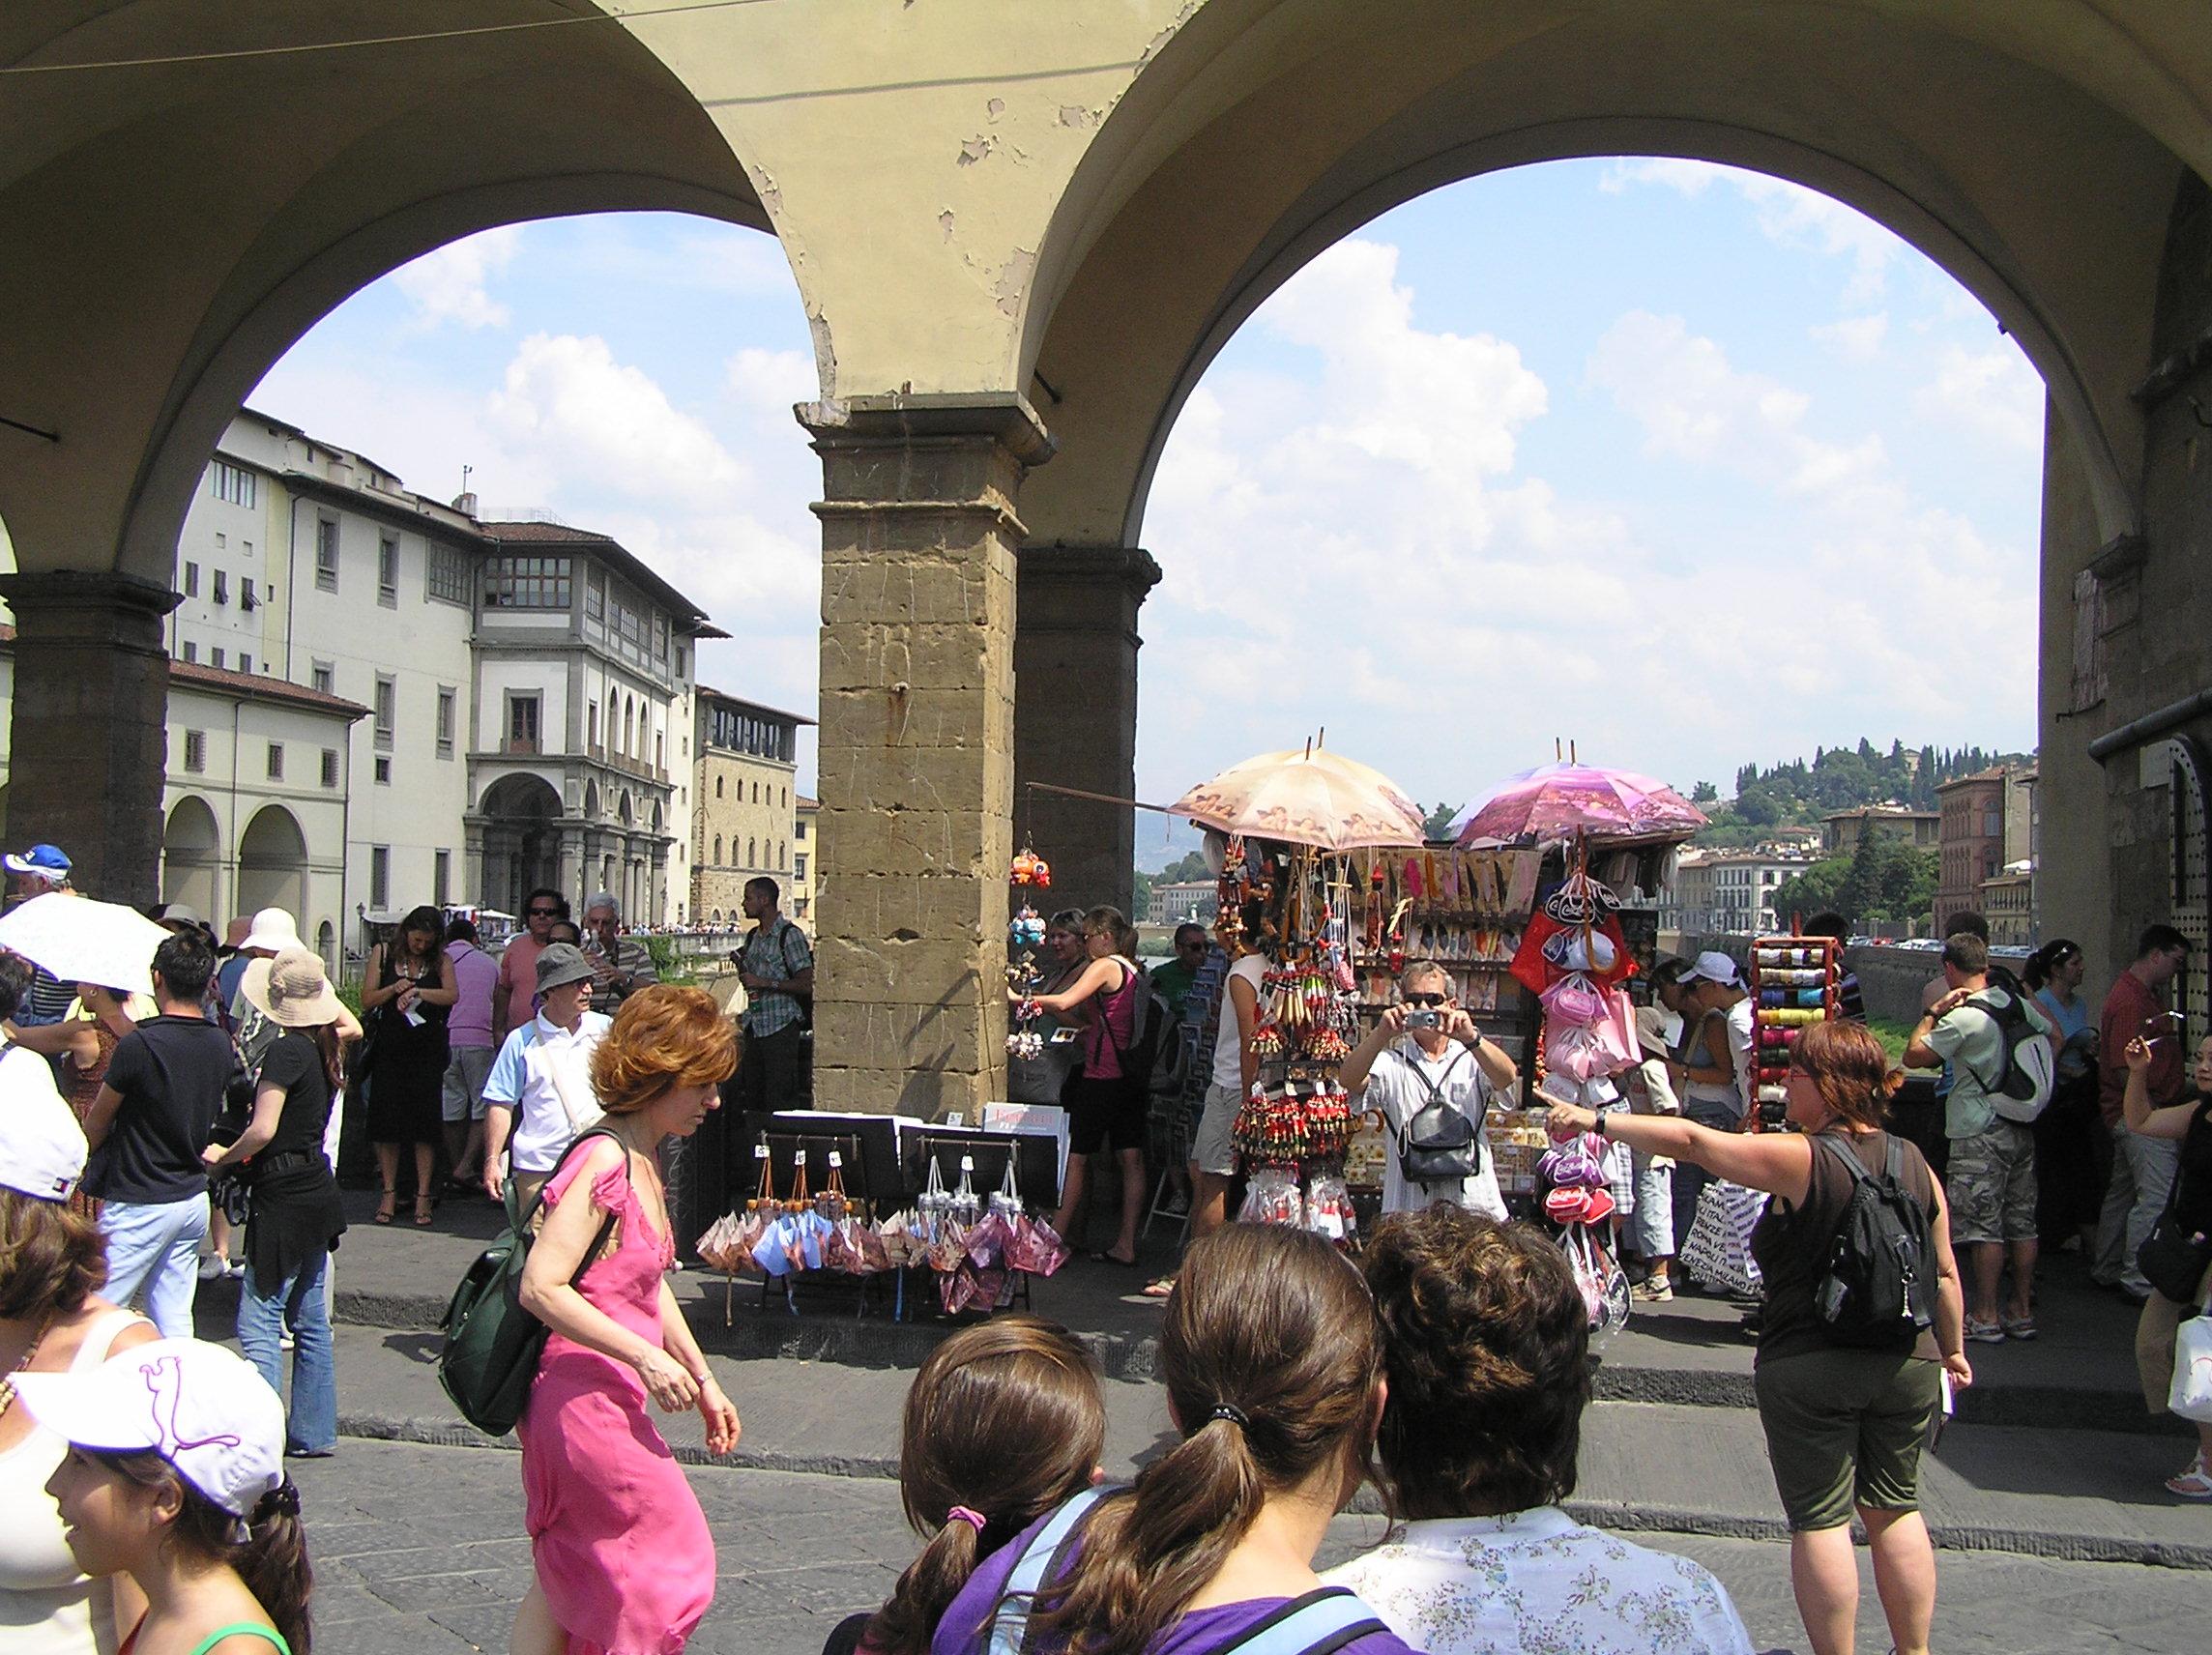 Itálie - Florencie - na Ponte Vecchio